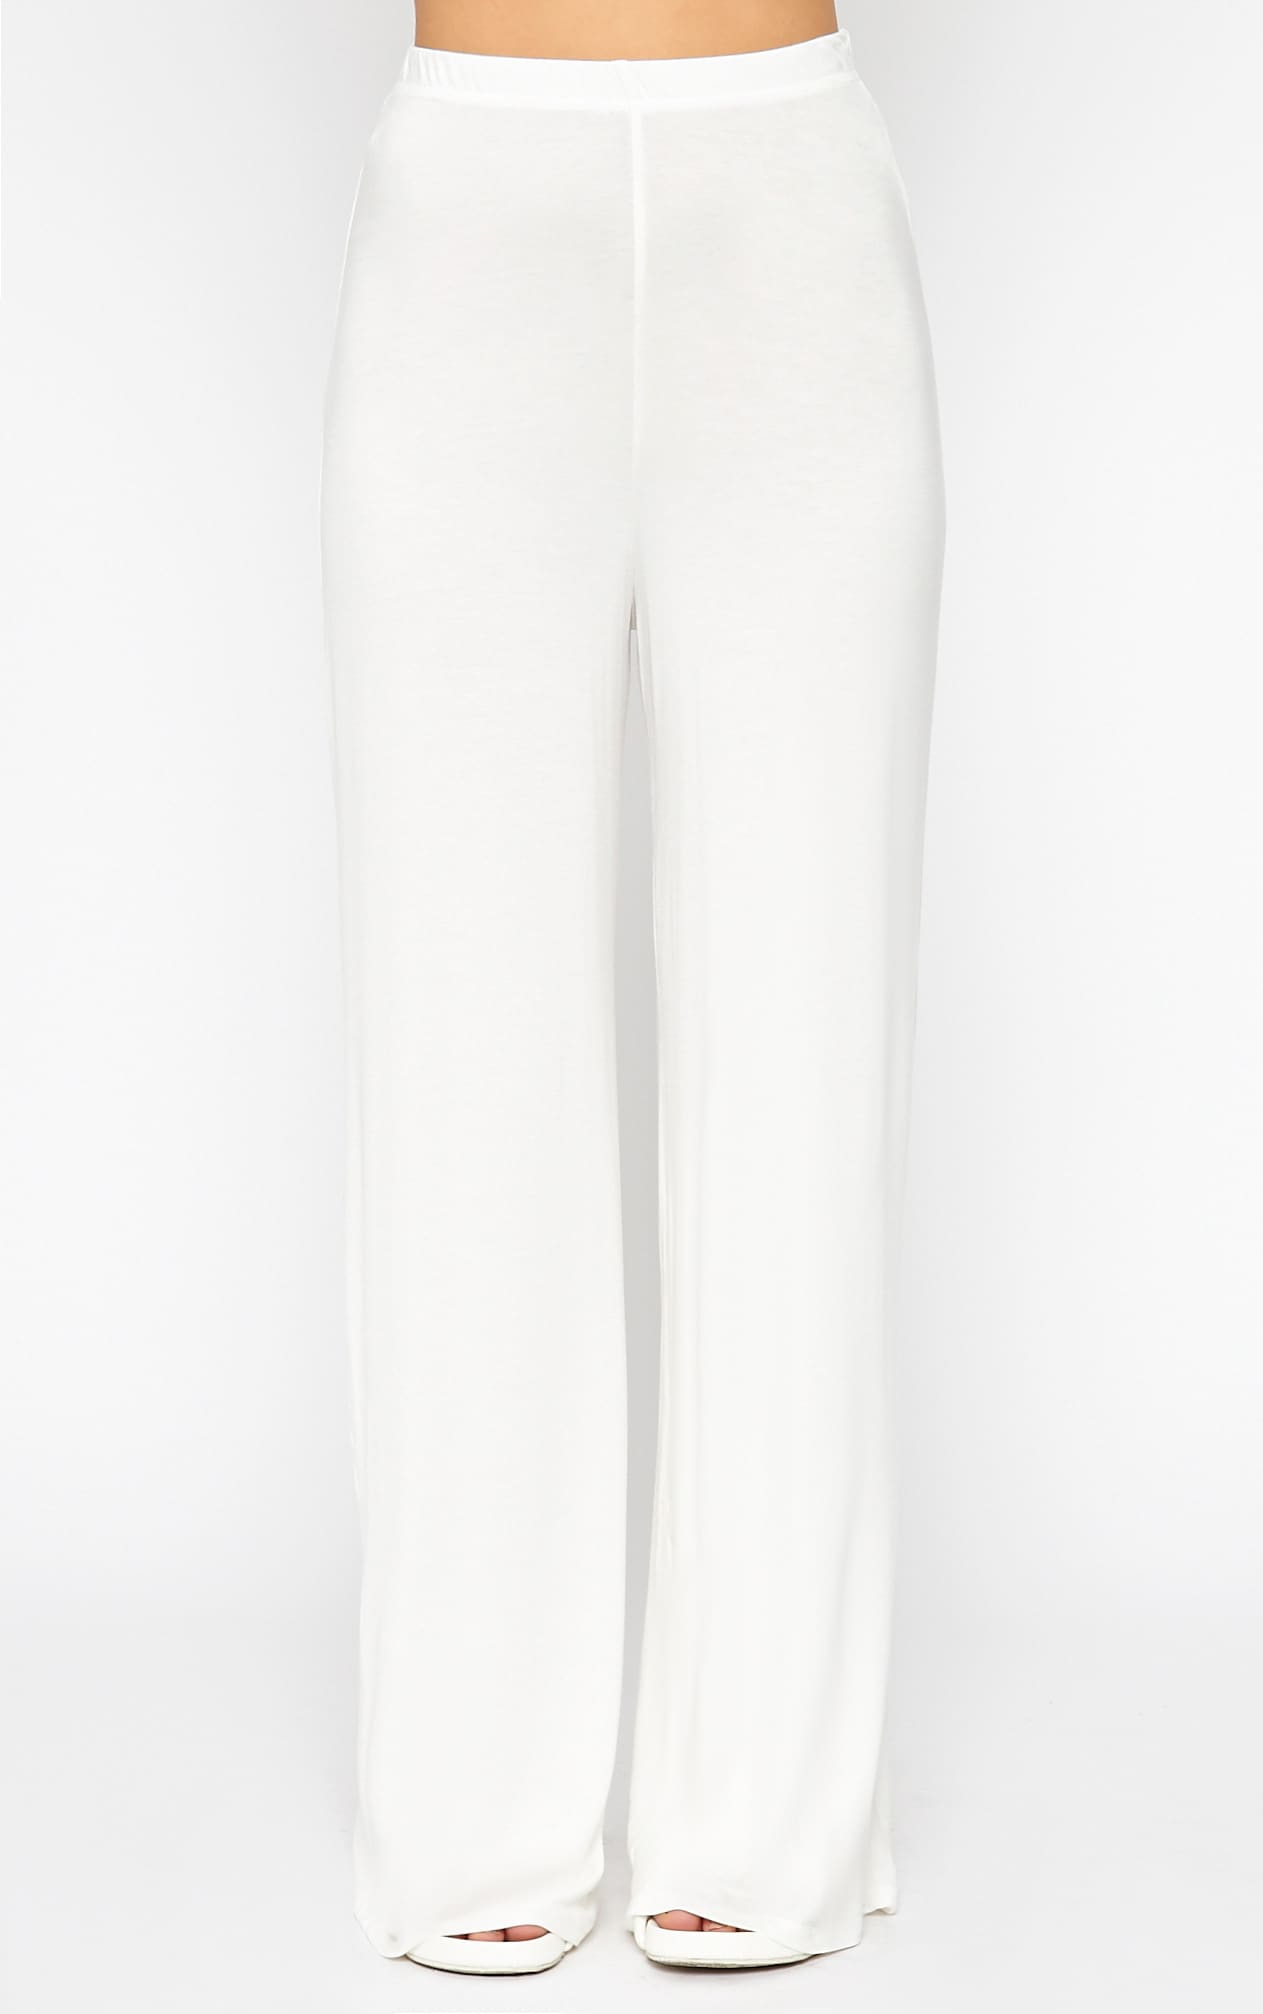 Radley Cream Wide Leg Trousers 2